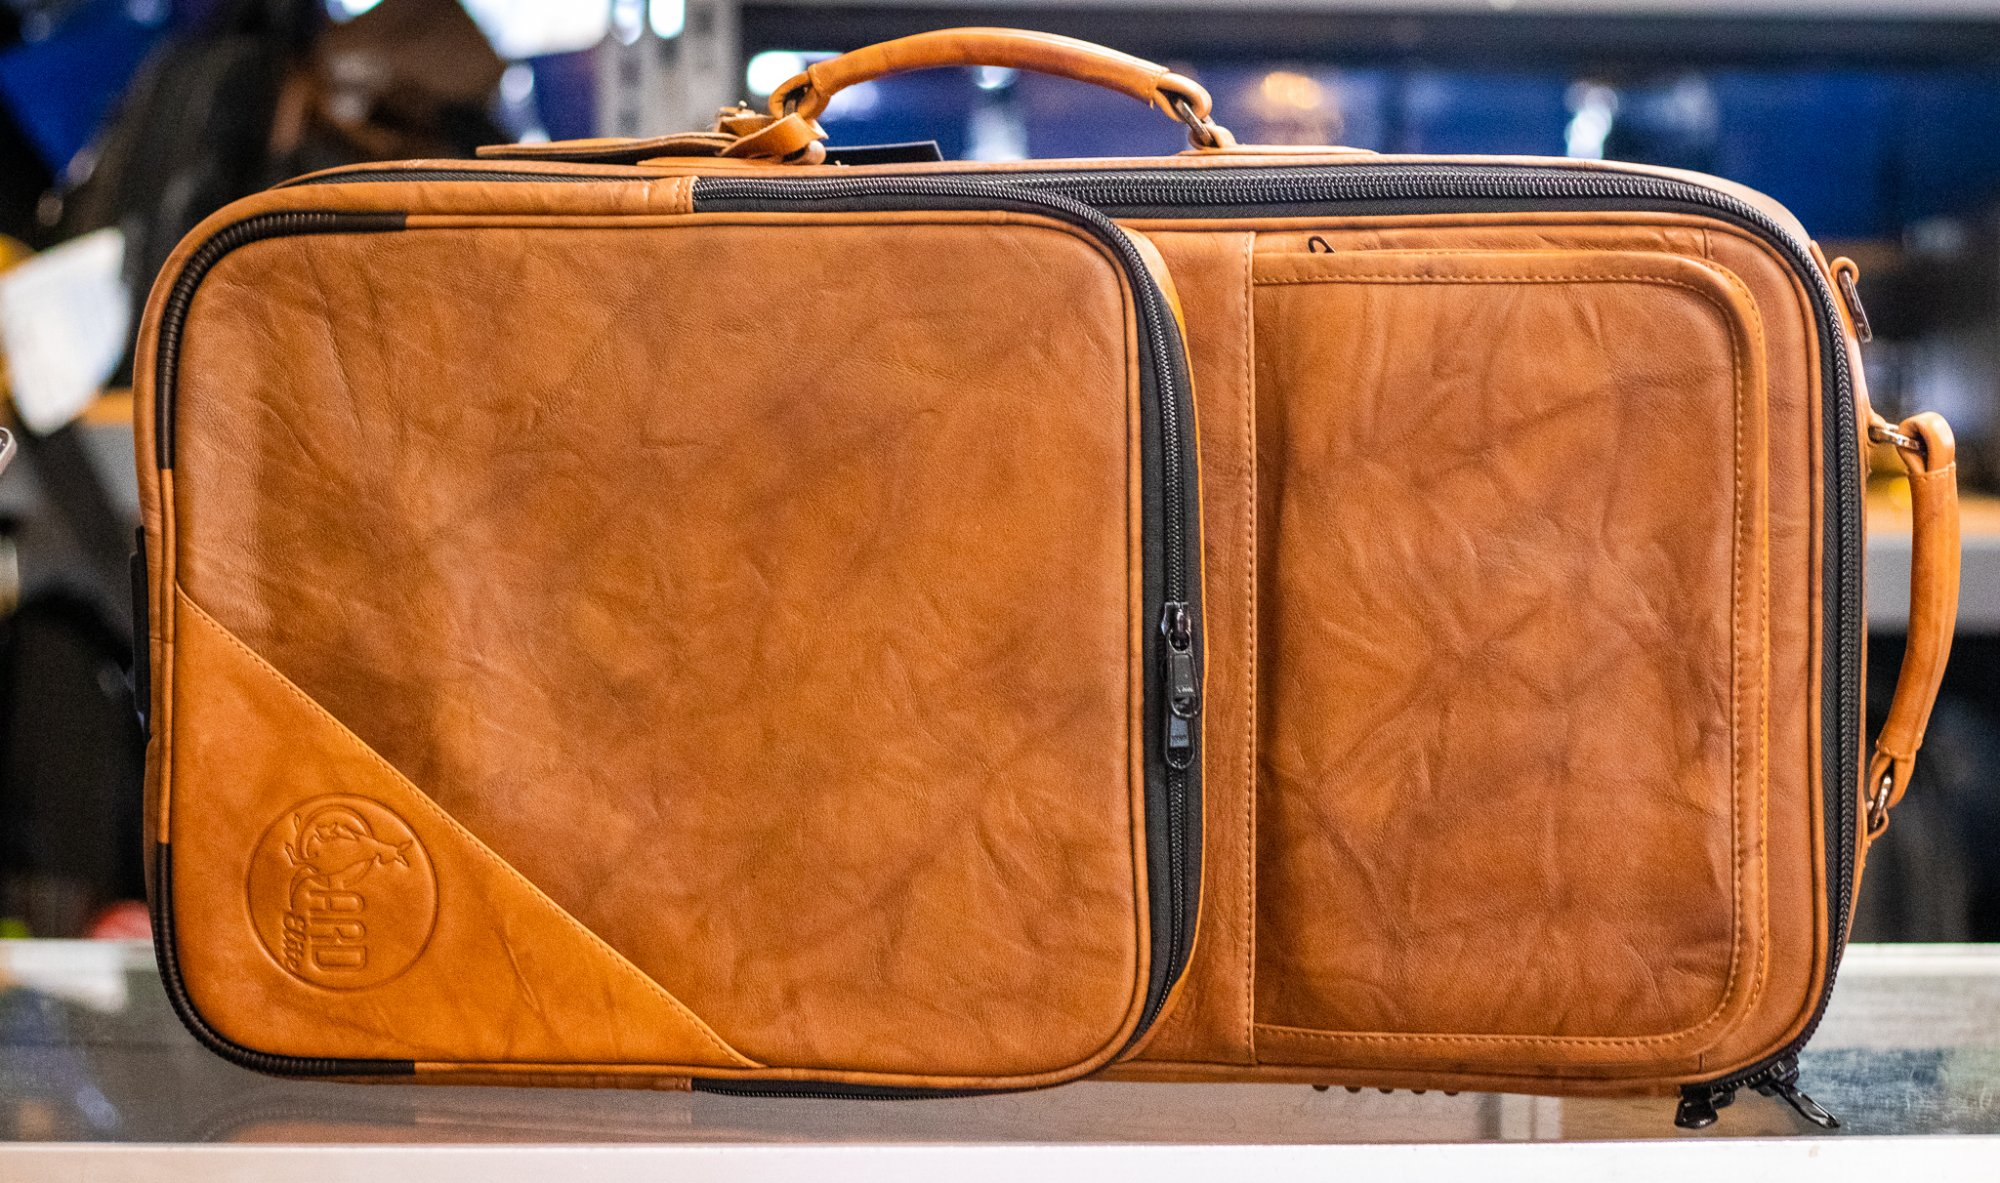 5-ECLN-LT GARD Elite - Compact Triple Trumpet Gig Bag in Marbled Tan Leather